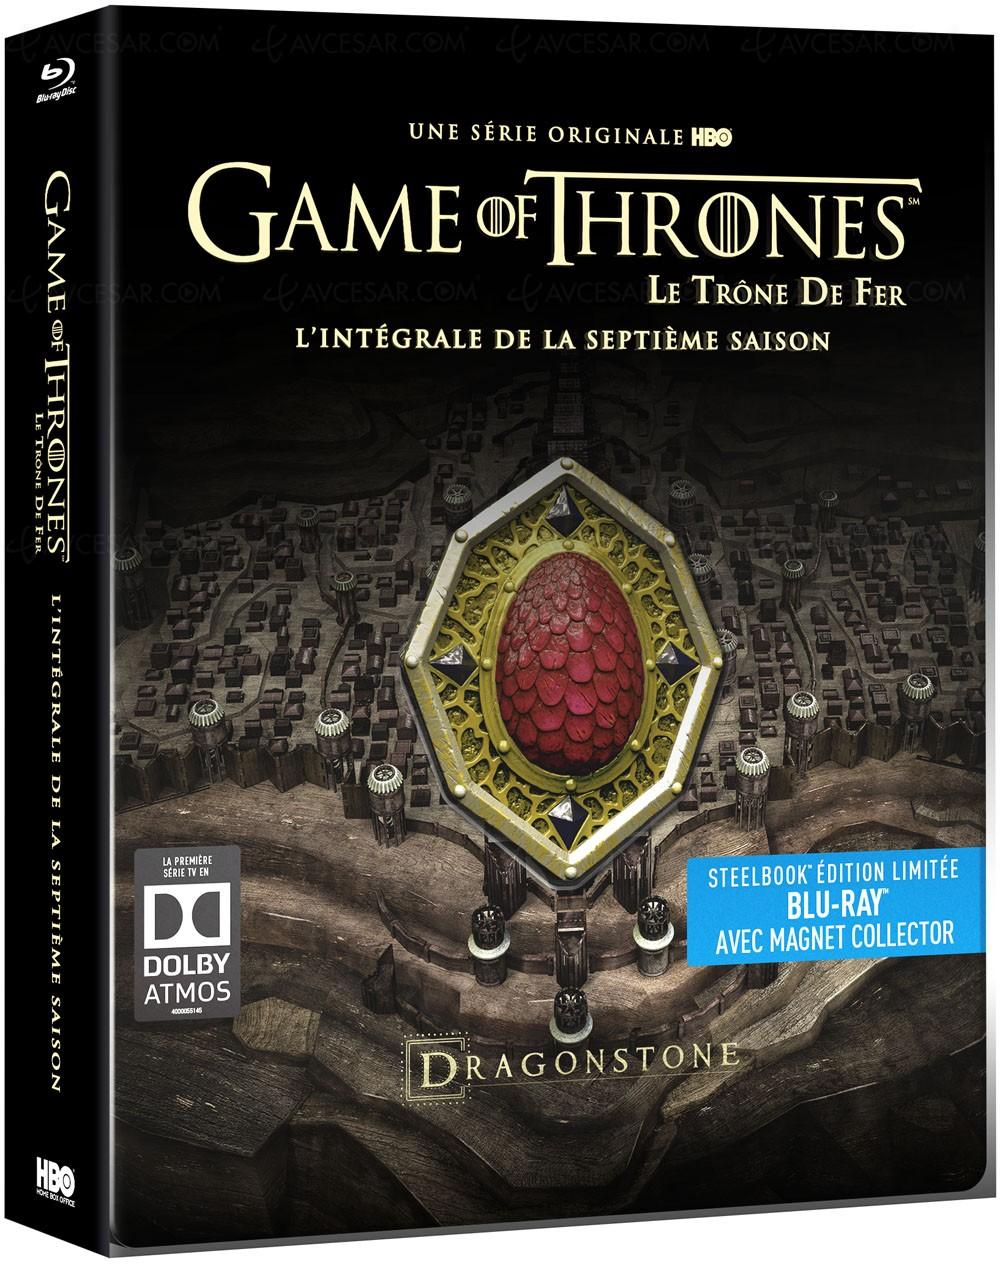 game of thrones saison 7 en blu ray et dvd 5 ditions au choix. Black Bedroom Furniture Sets. Home Design Ideas